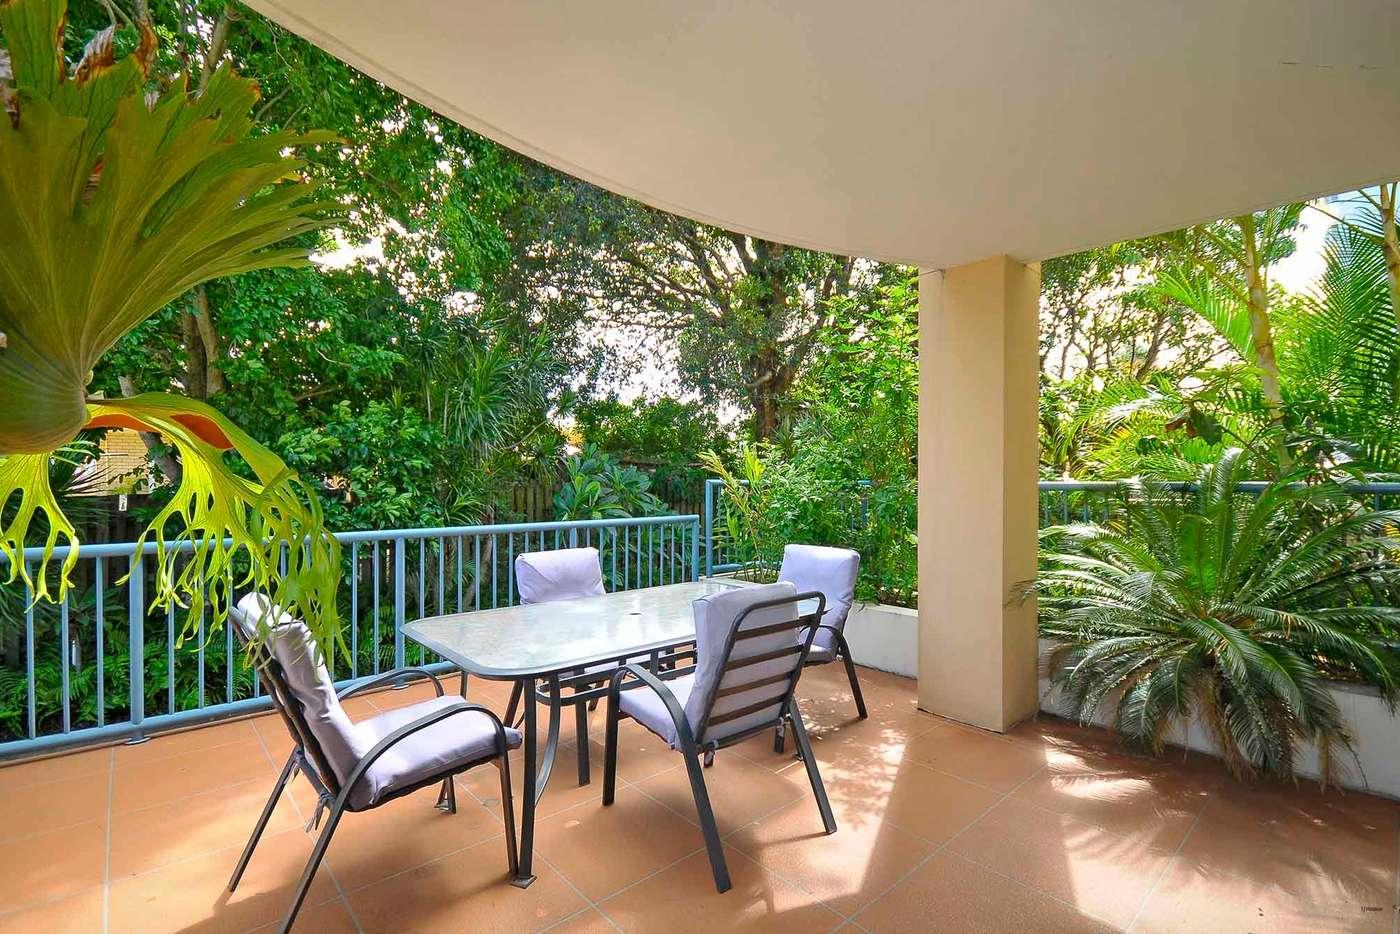 Main view of Homely unit listing, 3/19 Twenty Fourth Avenue, Palm Beach QLD 4221